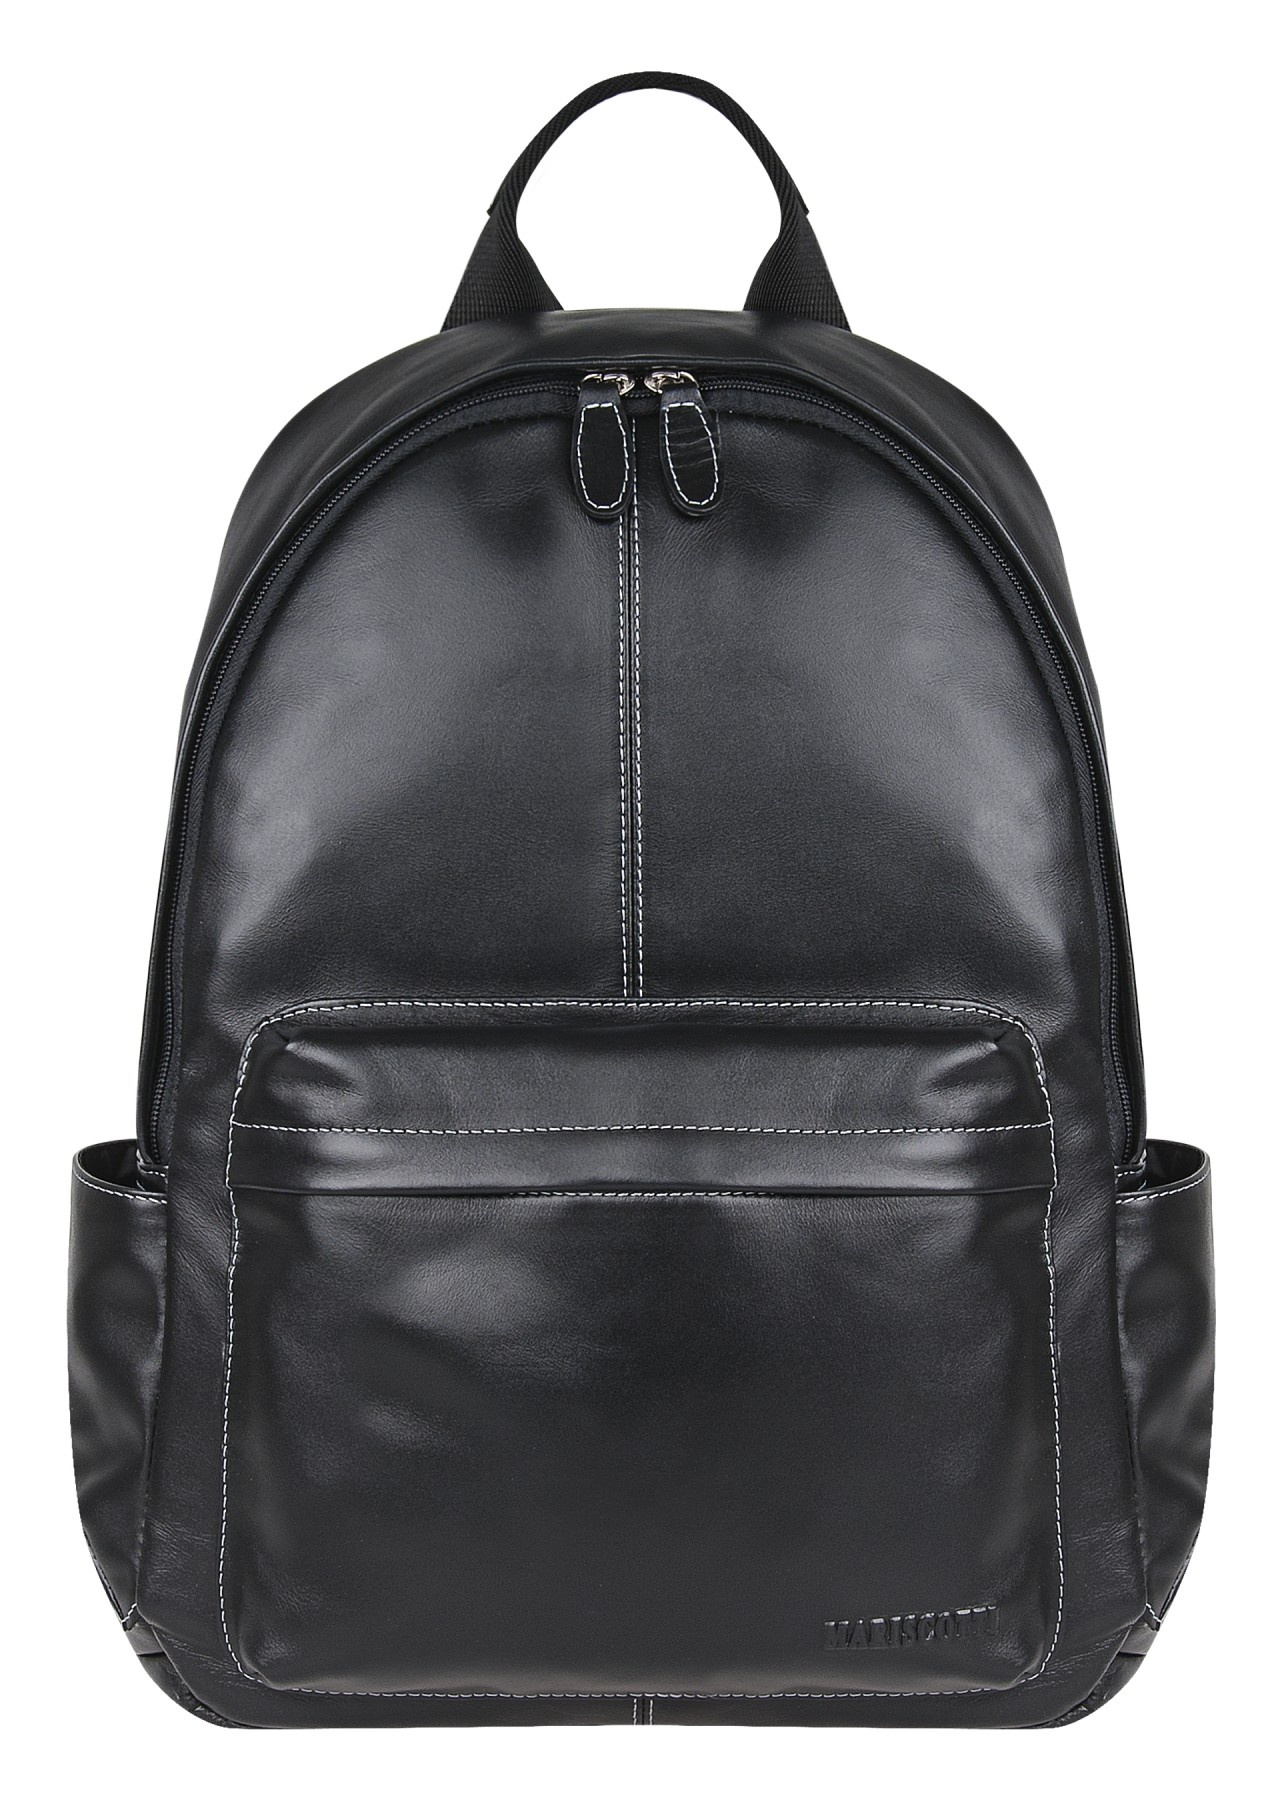 Сумка плечевая Franchesco Mariscotti рюкзак натуральная кожа мужской